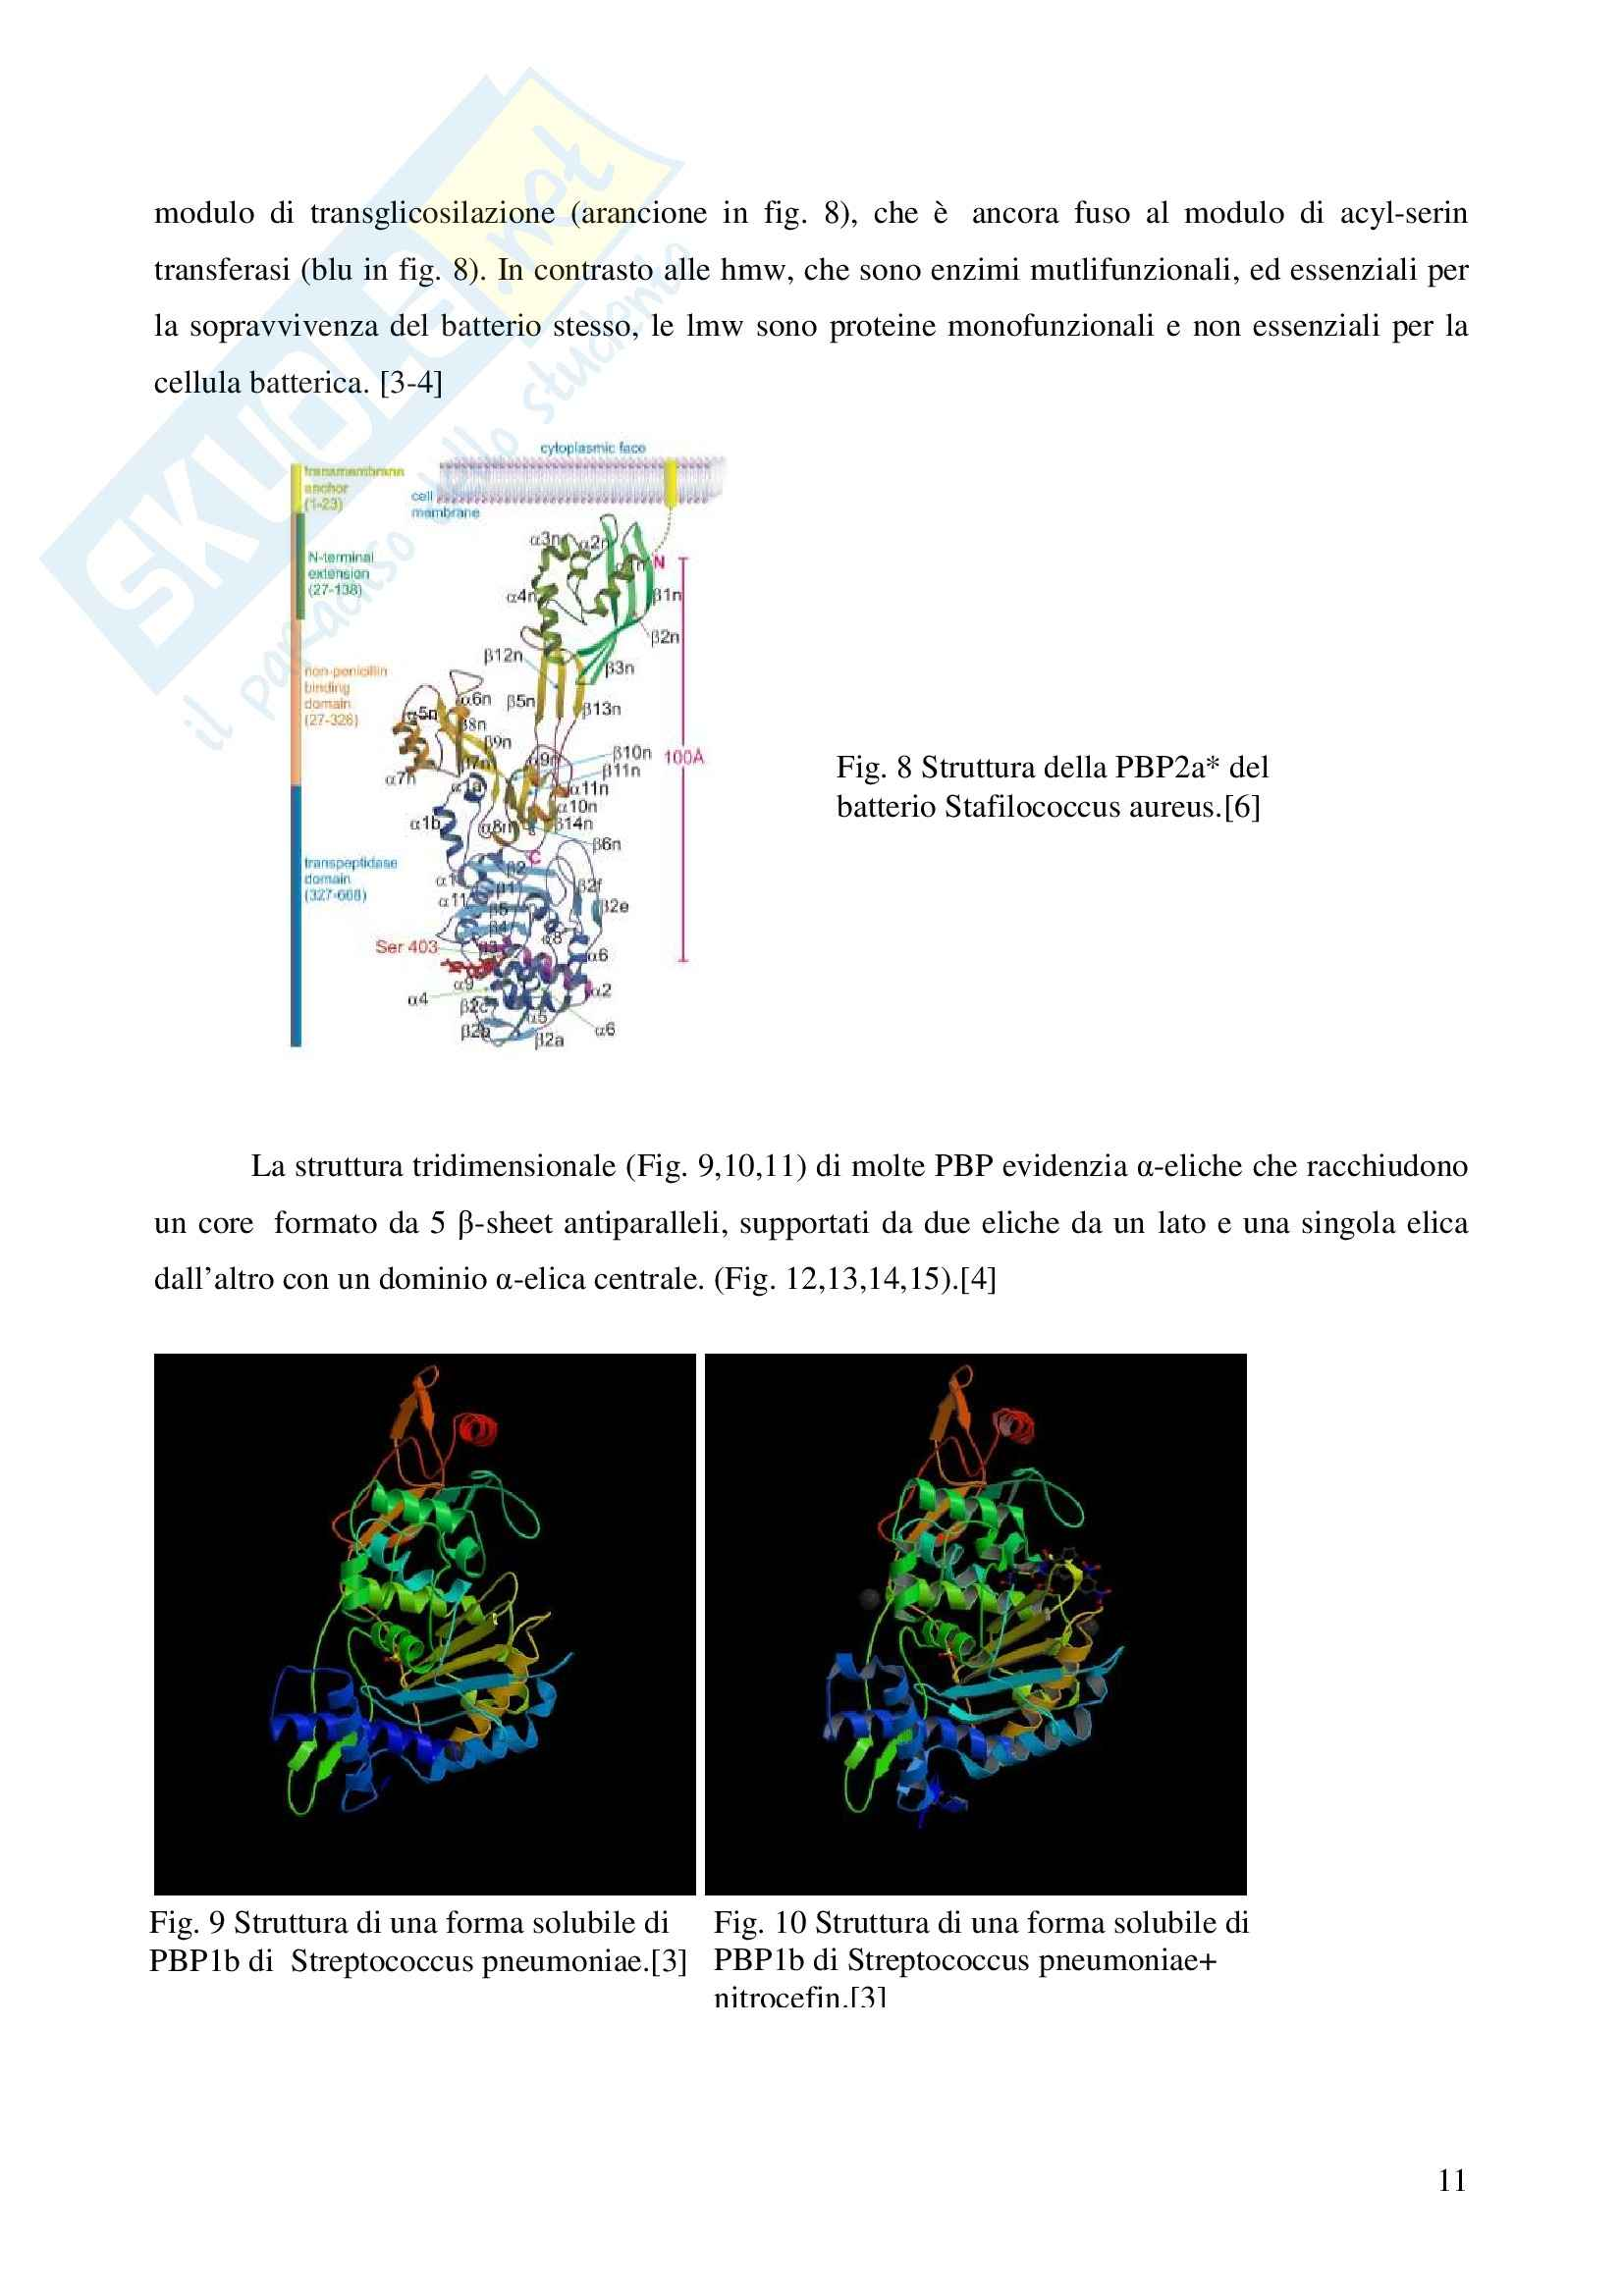 Chimica farmaceutica - le cefalosporine Pag. 11